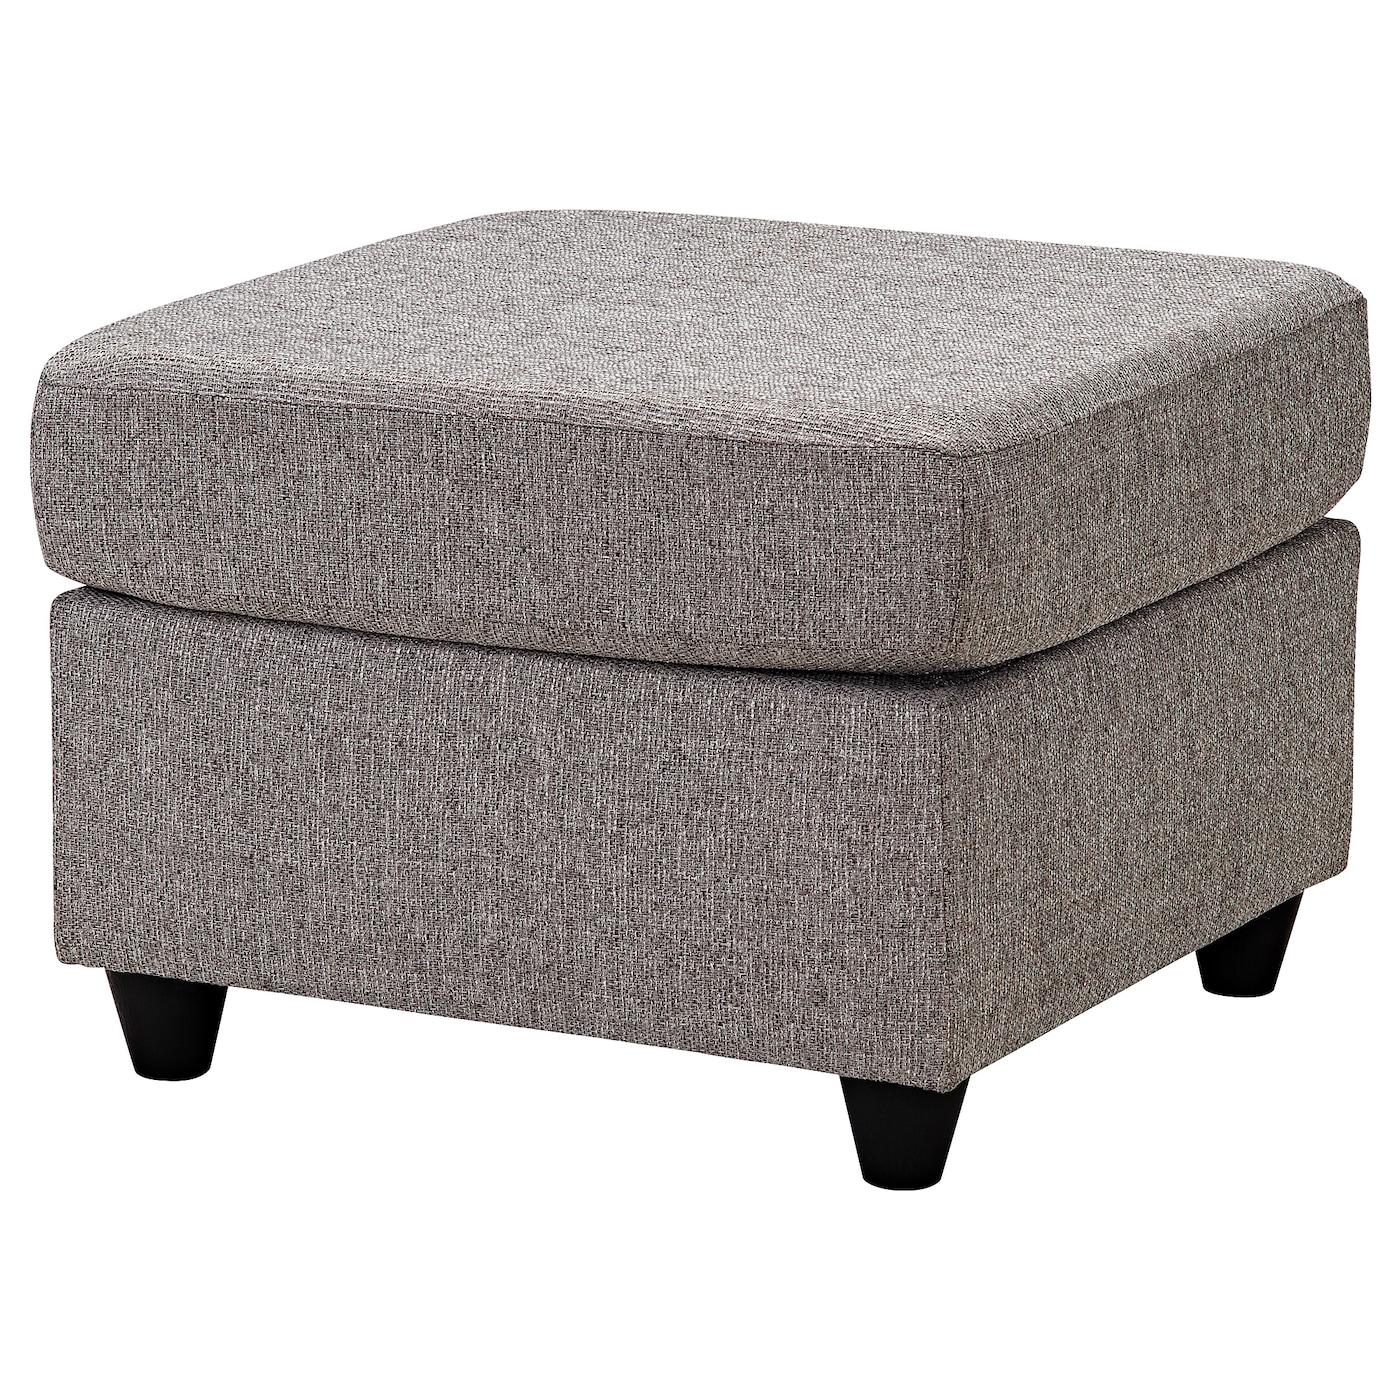 Ikea Bankeryd Footstool